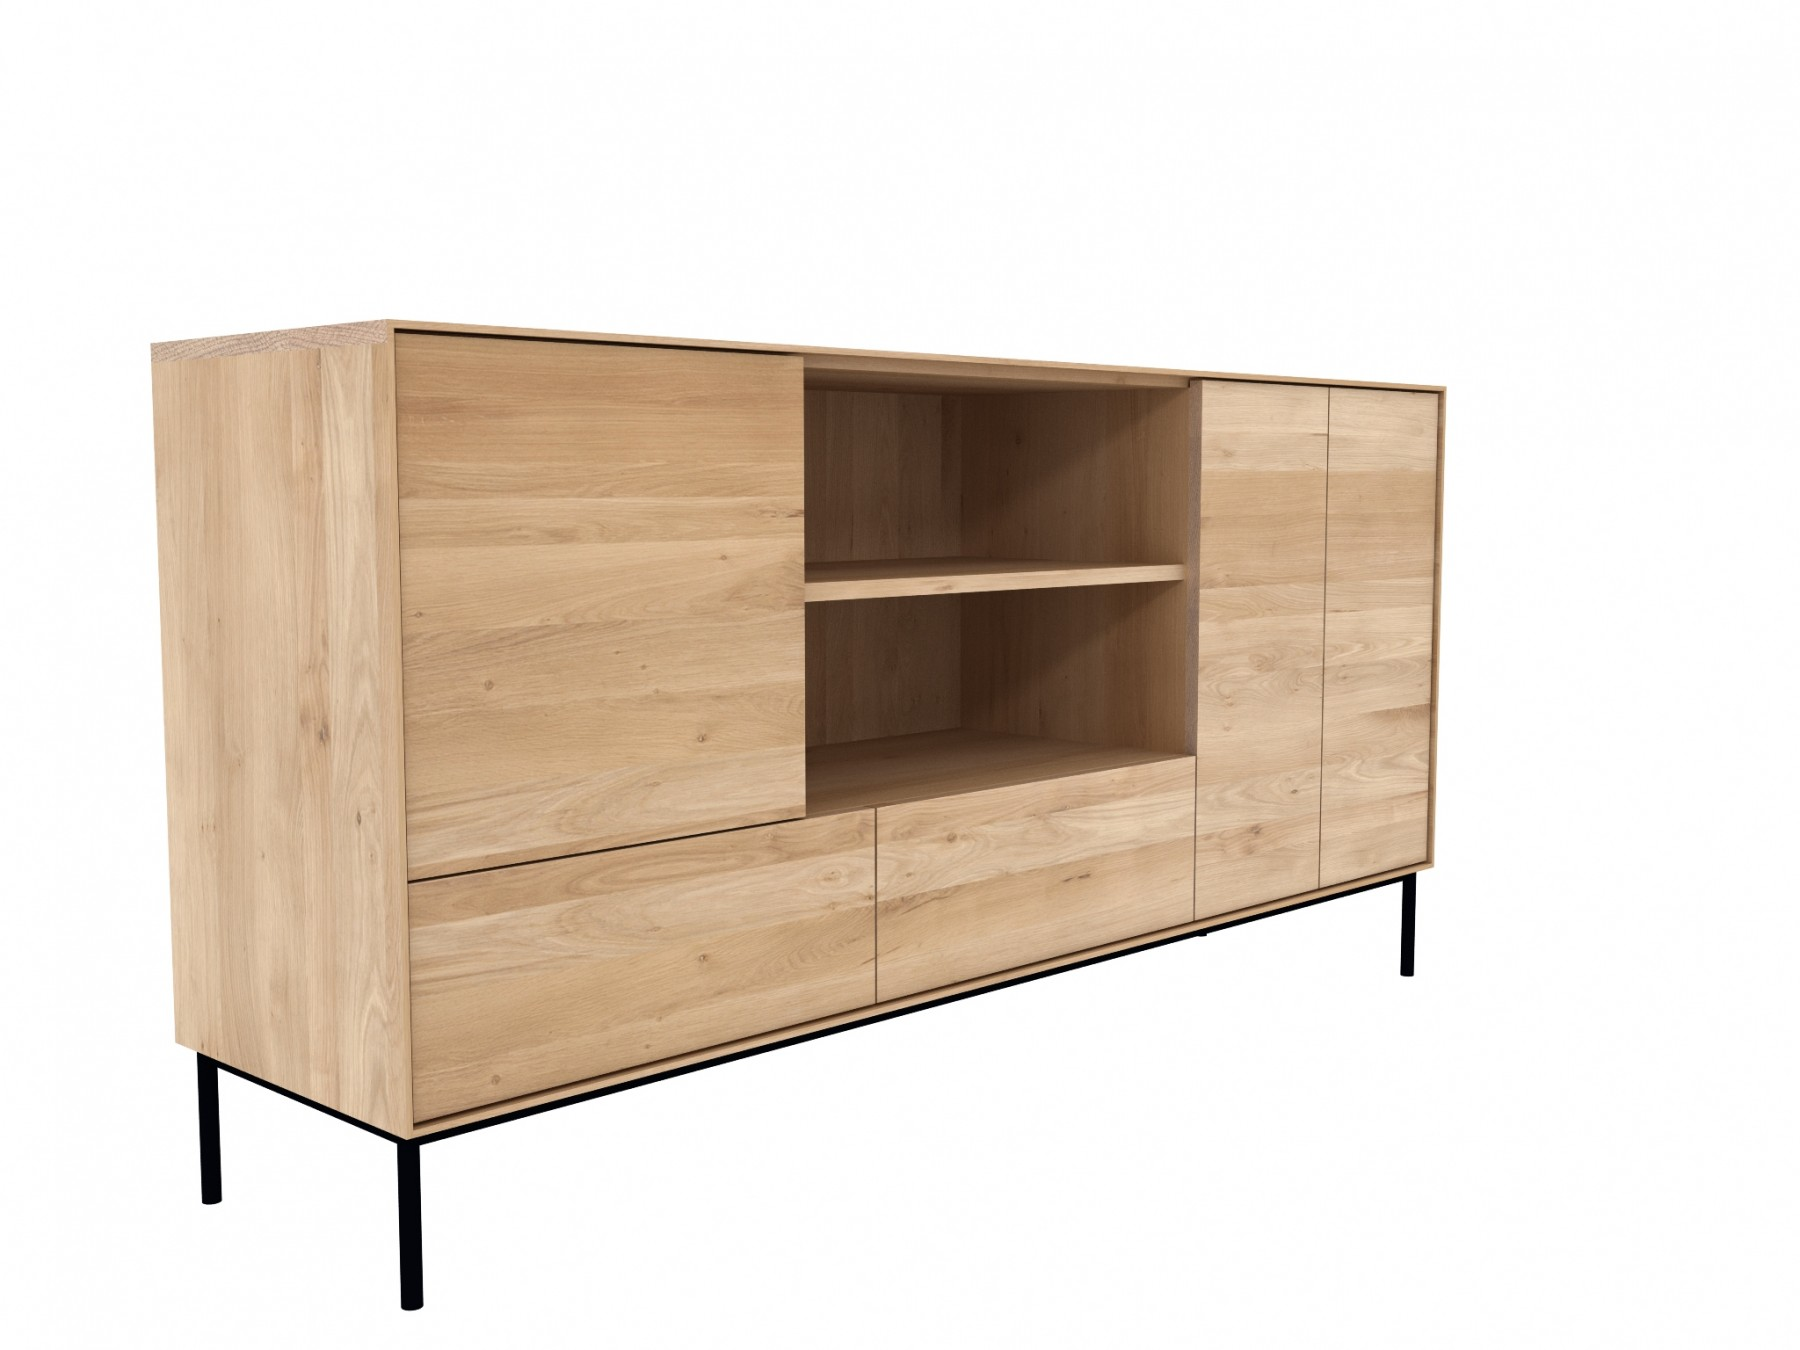 Ethnicraft Oak Whitebird Sideboard 3 Doors 2 Drawers